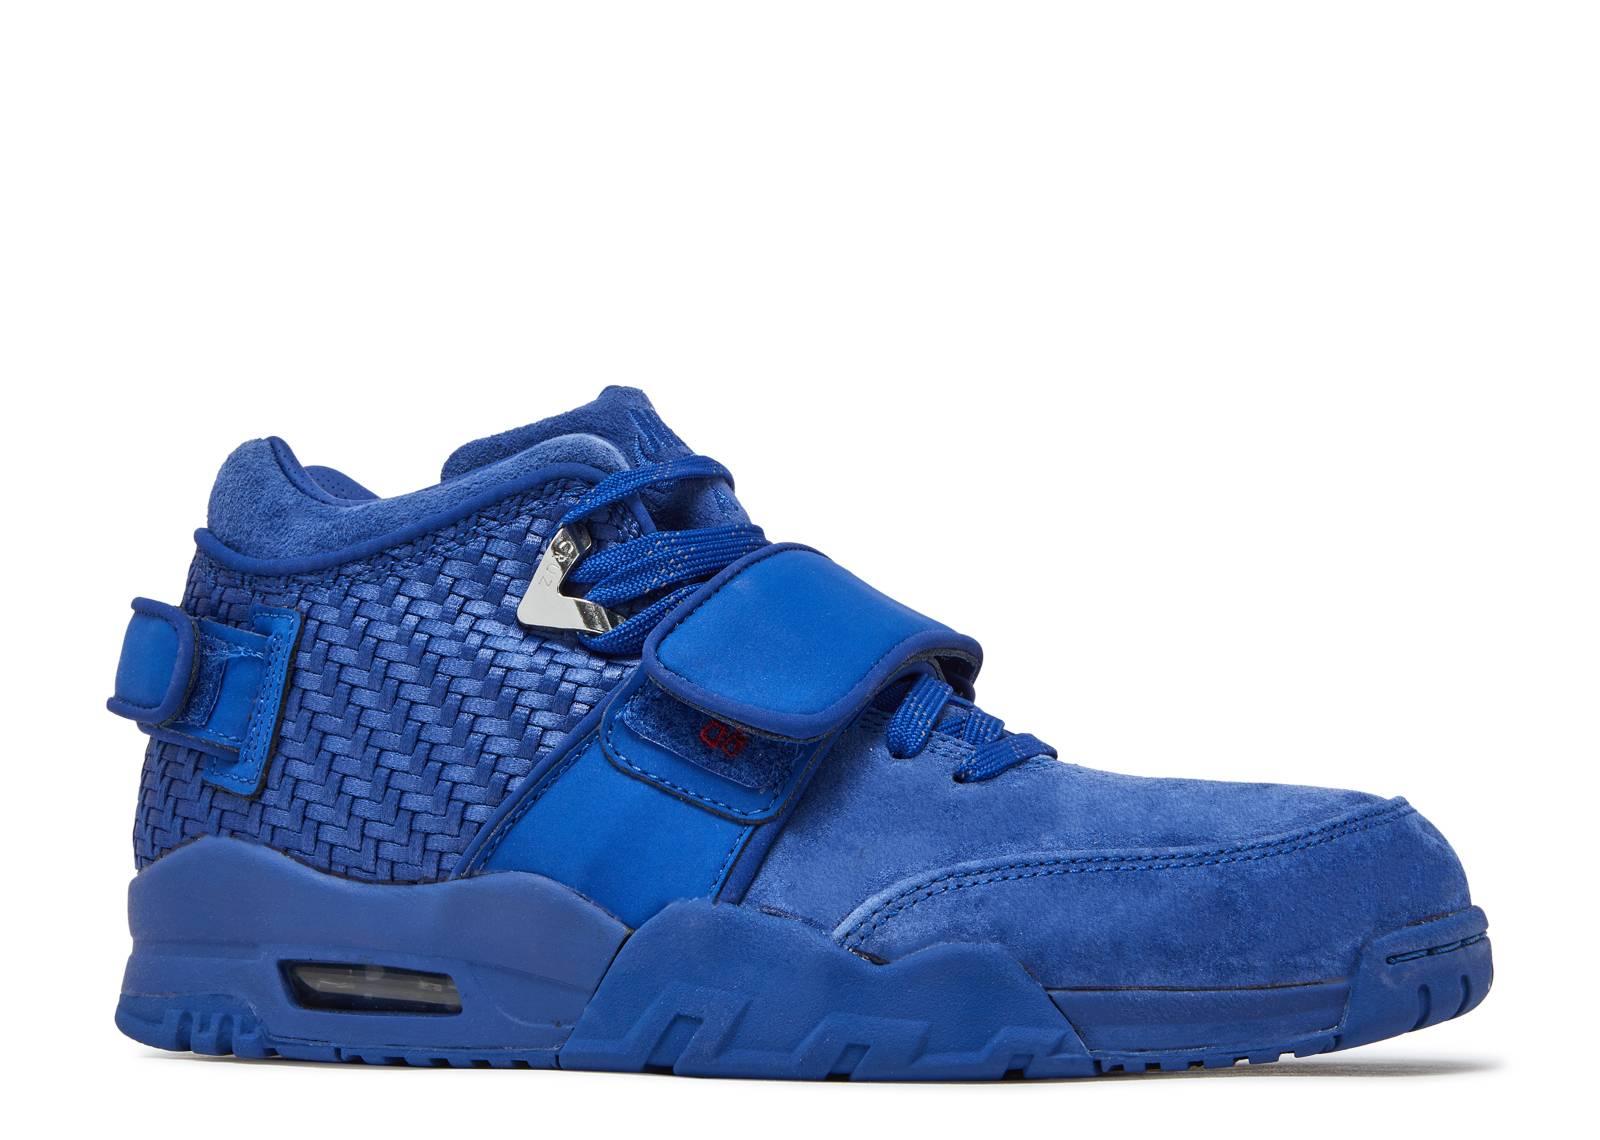 info for 34b68 5c8ea 2016 nike air trainer v cruz prmwolf greygrey gris mens shoes online  air  tr. v. cruz prm rush blue nike 812637 400 rush blue rush blue